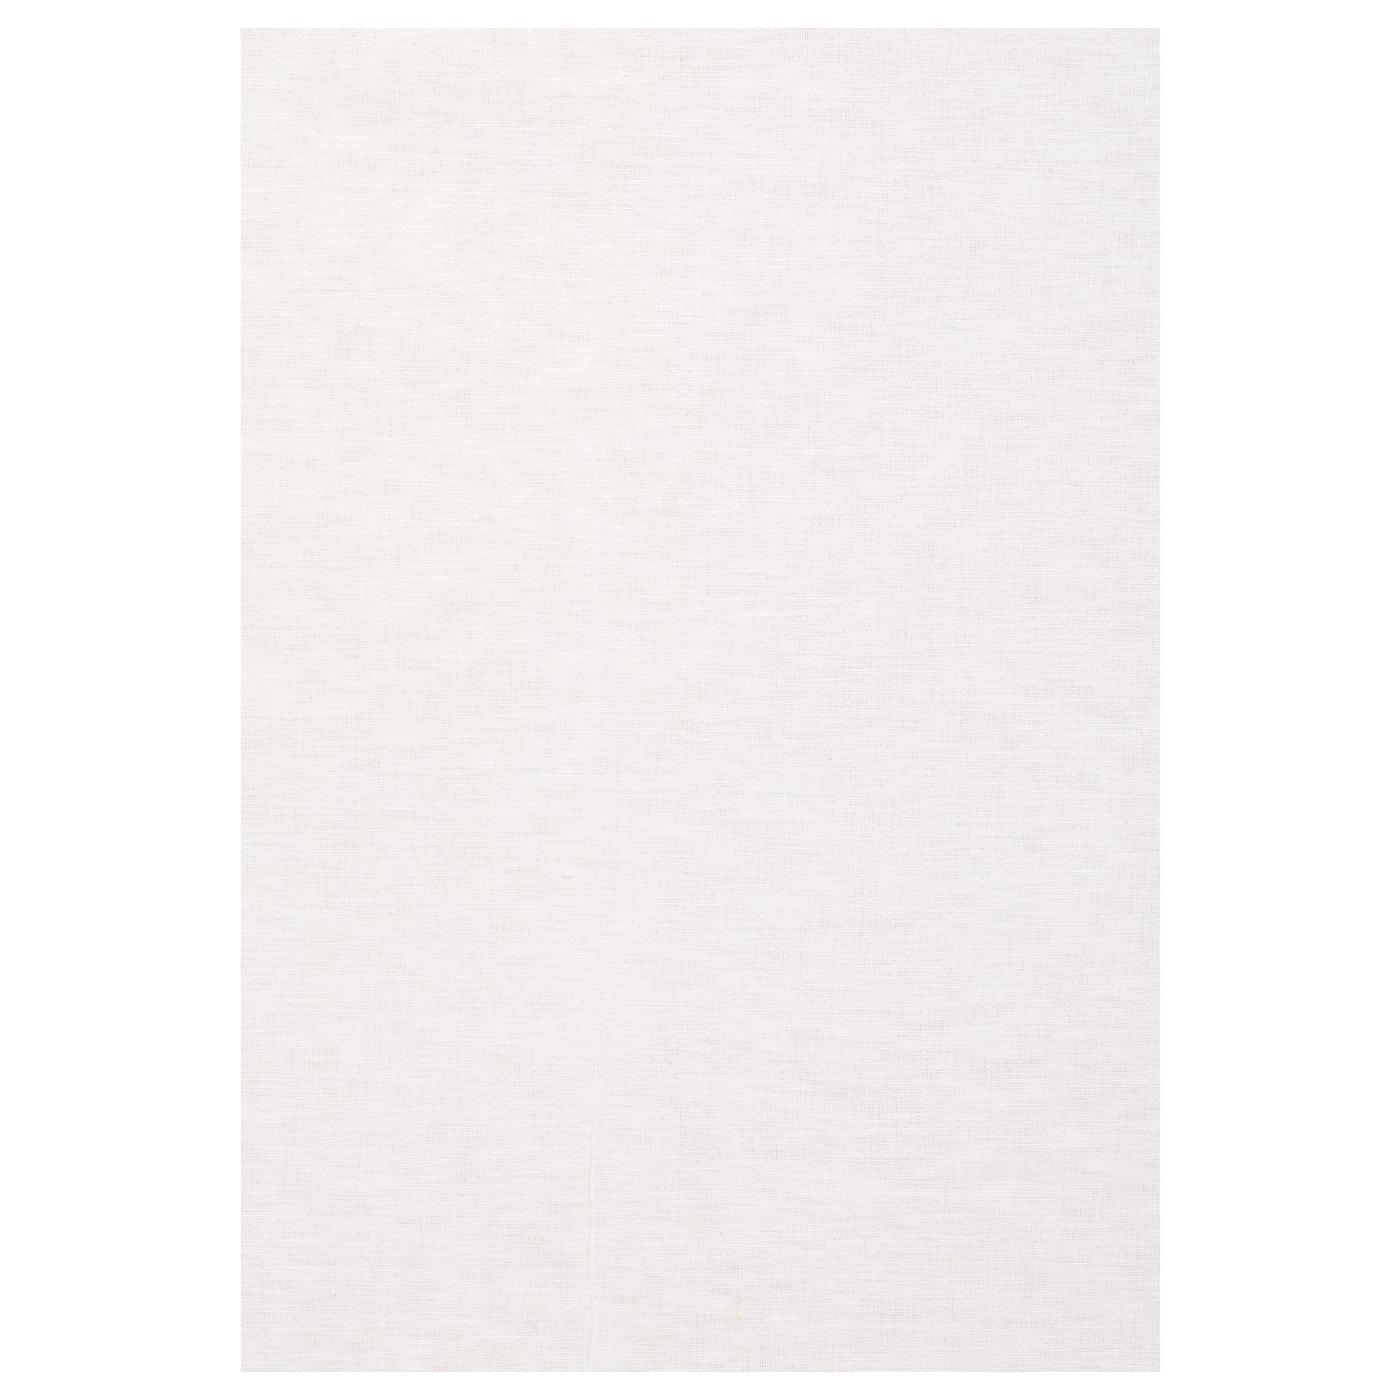 Lenda tissu au m tre blanc 150 cm ikea - Tissu au metre ikea ...